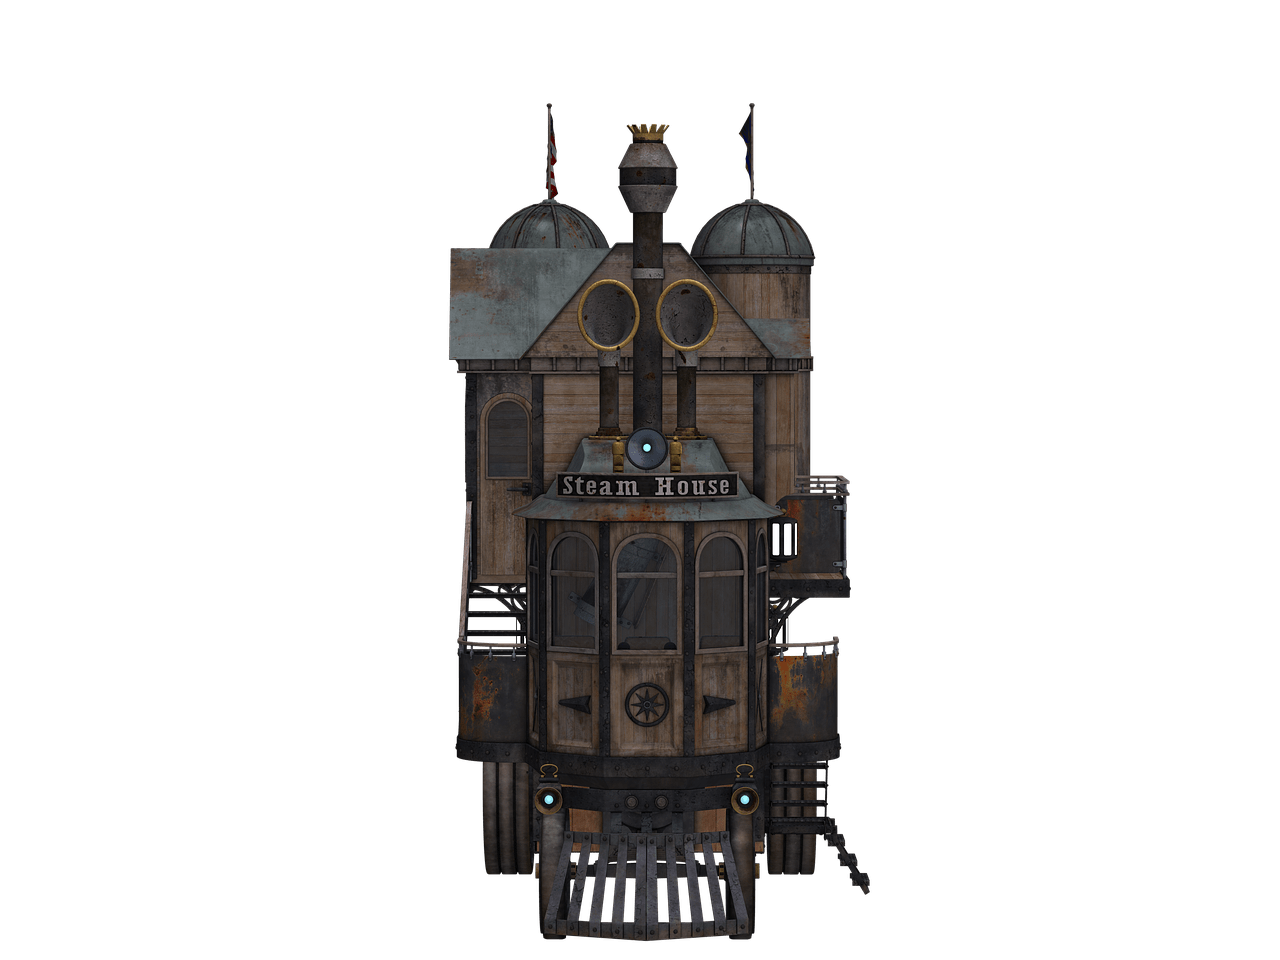 Steampunk clipart architecture. Locomotive front view transparent